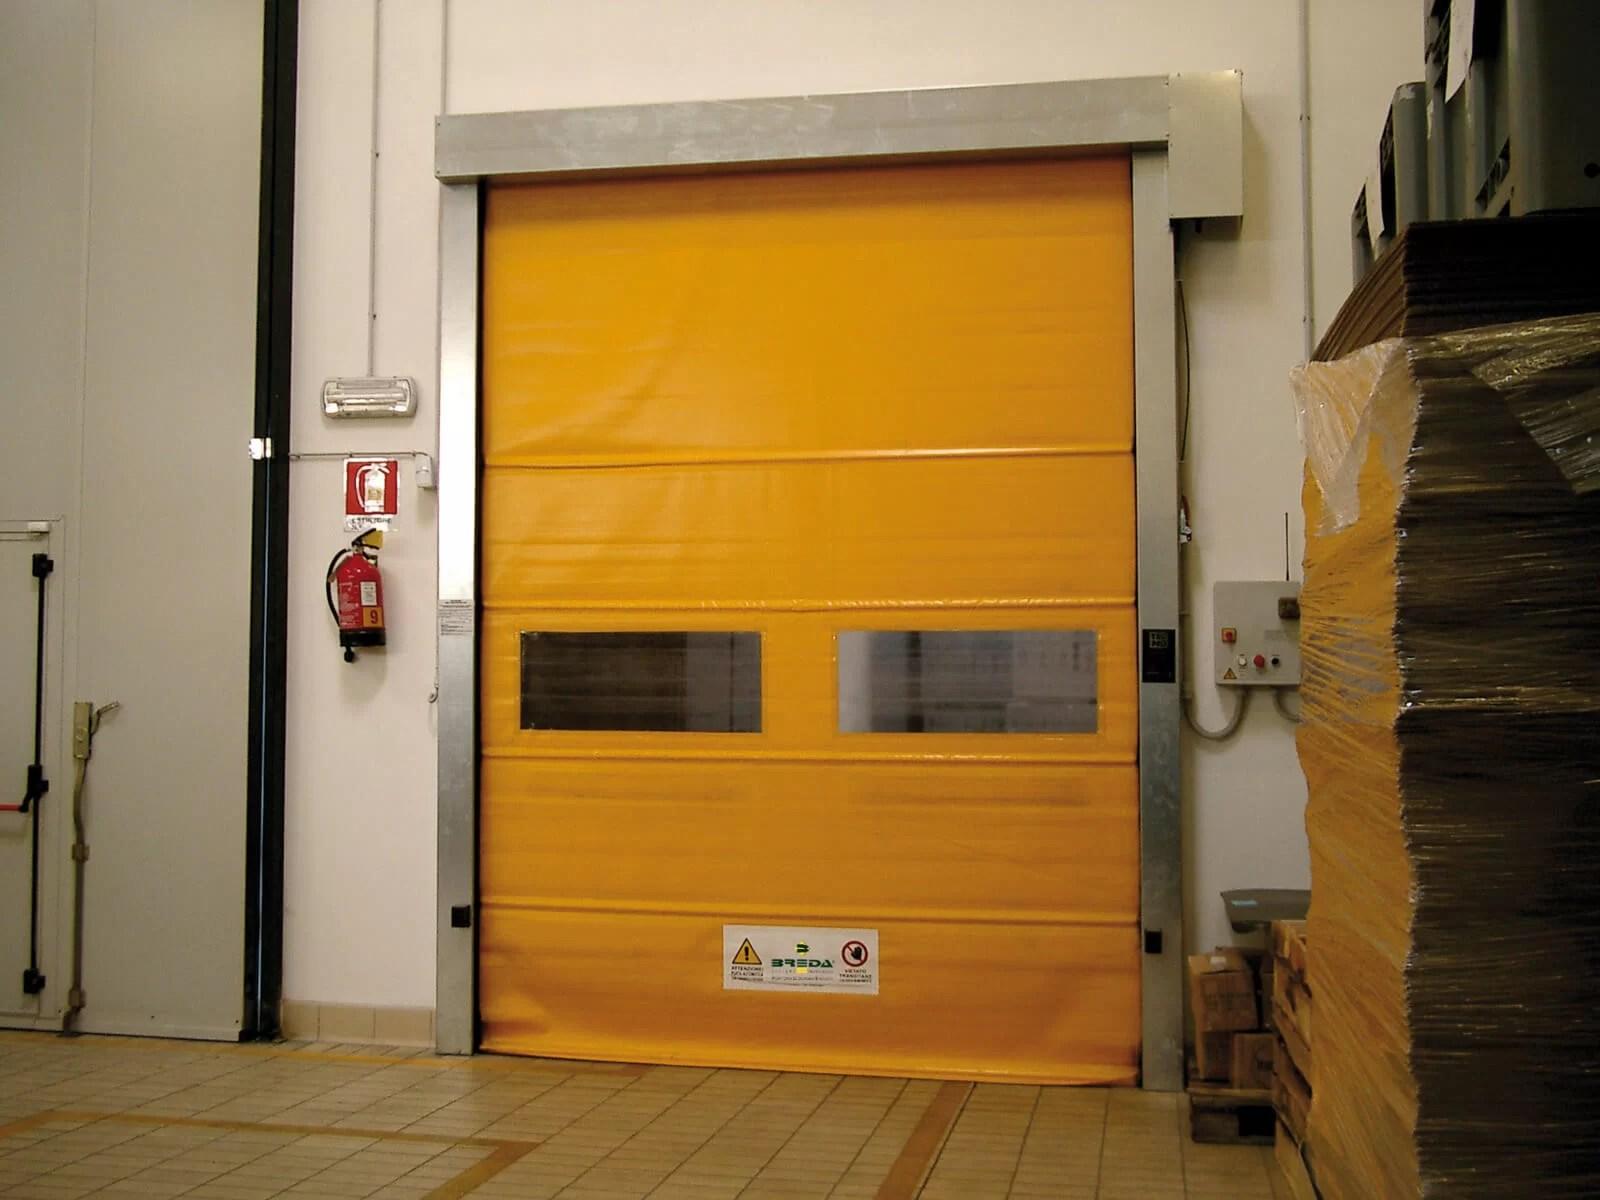 Porta rapida ad avvolgimento SAETTA - Giallo RAL 1003